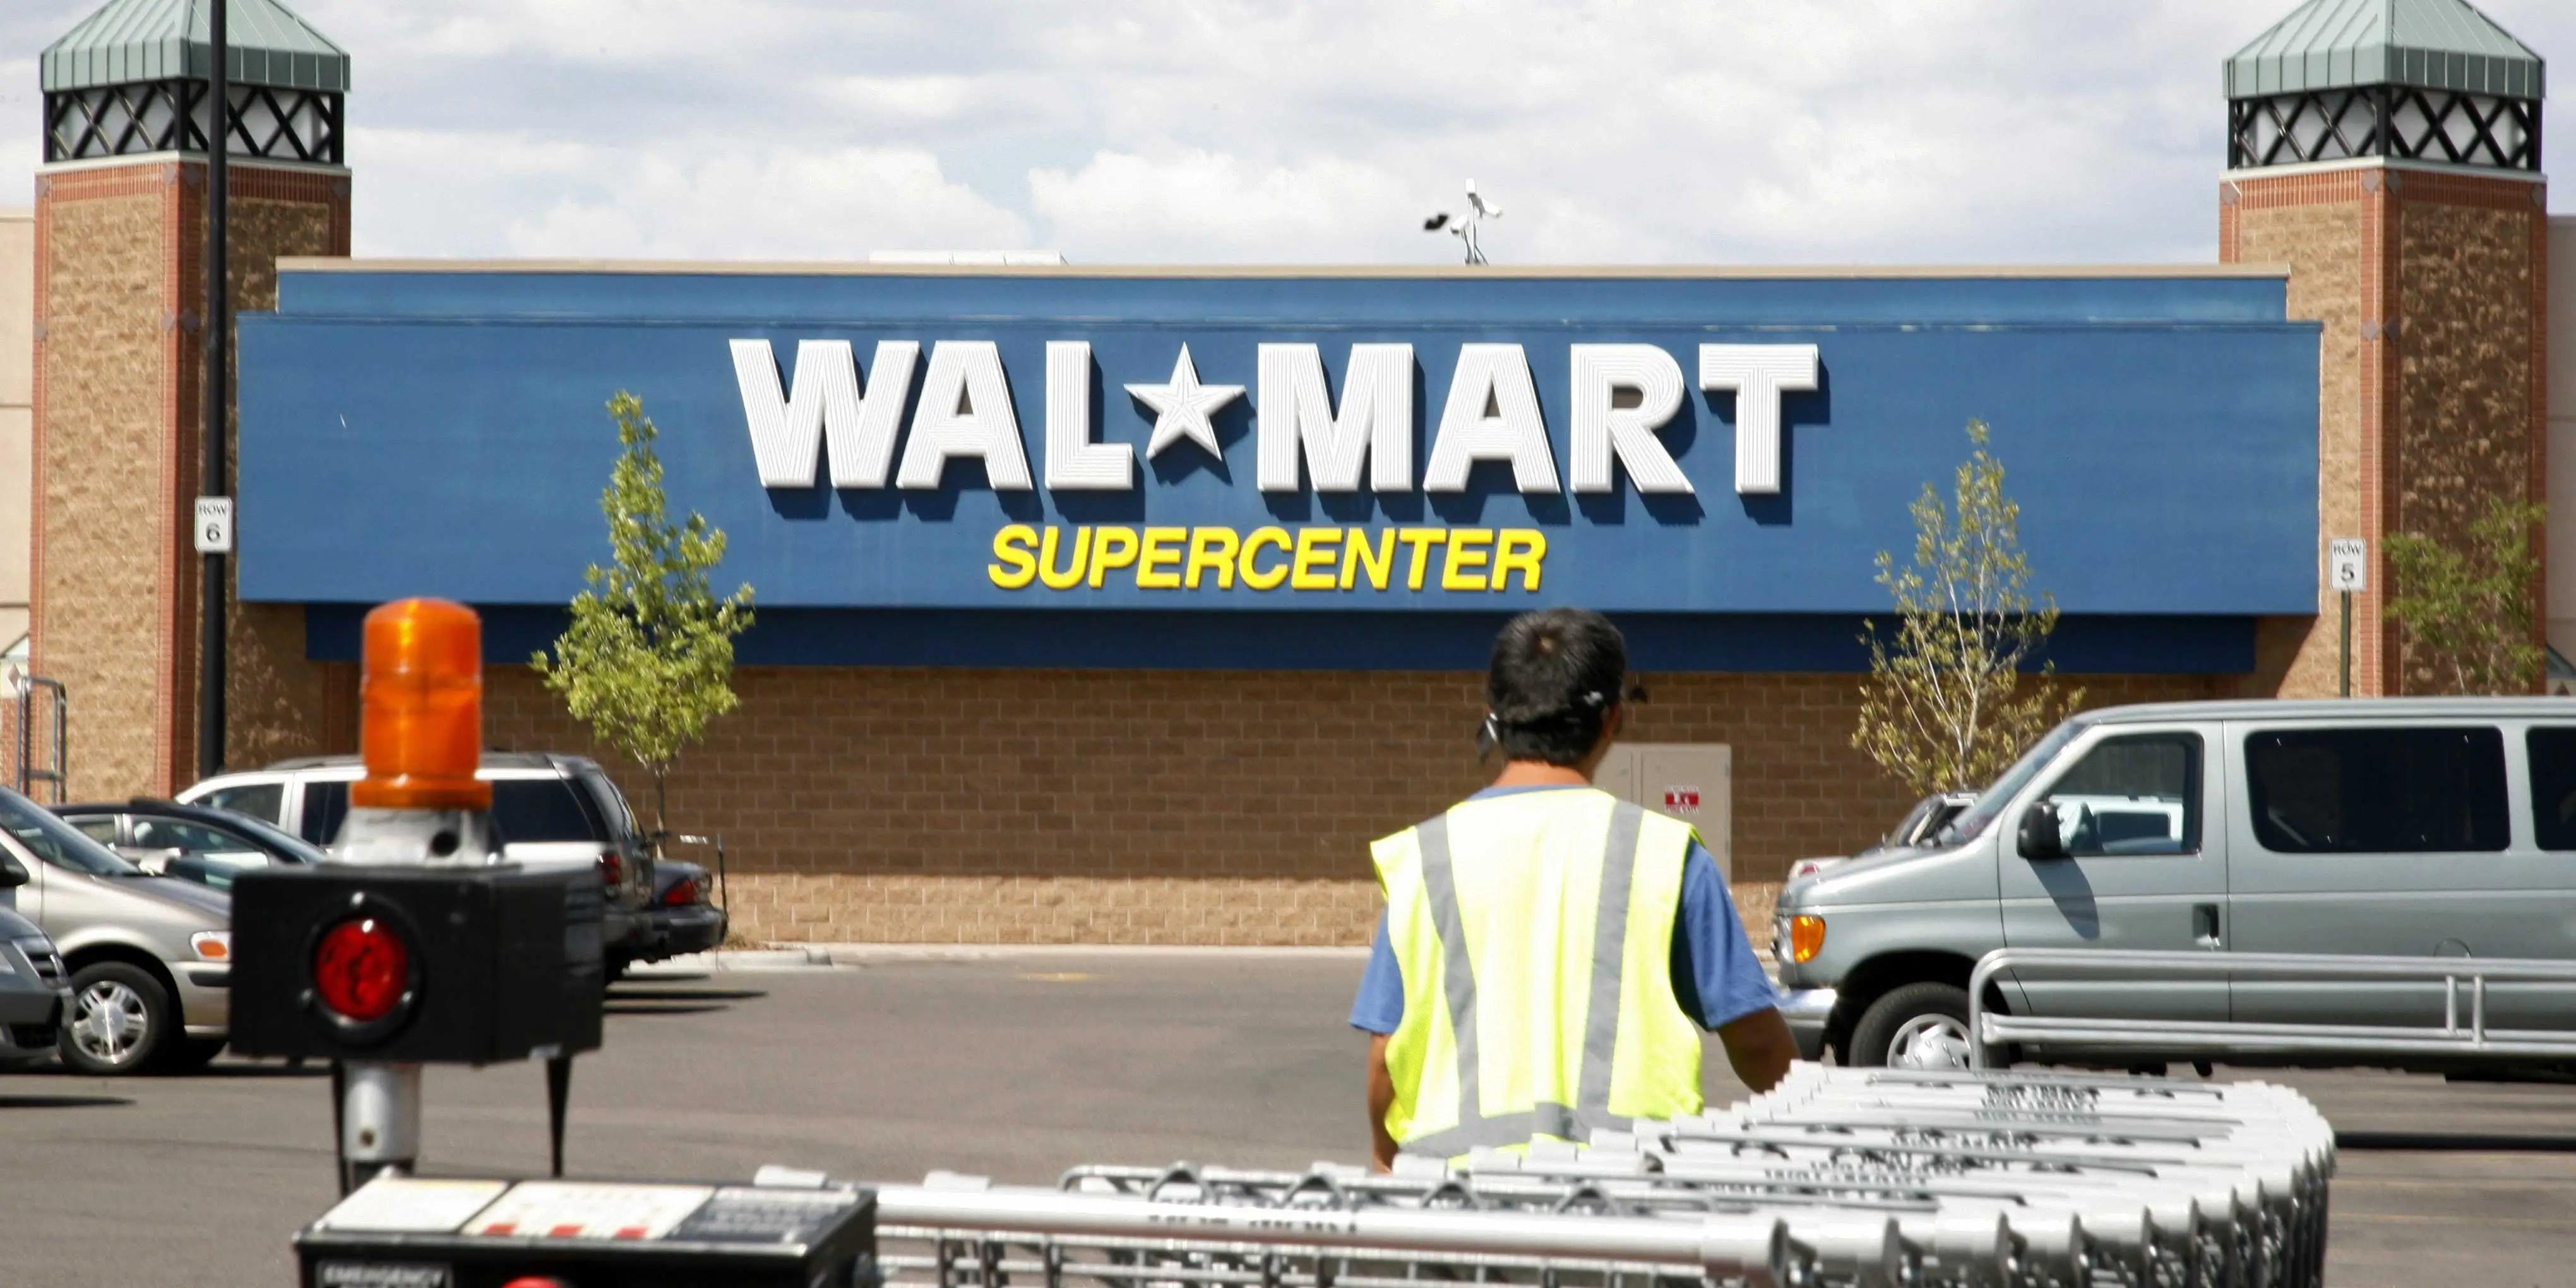 Radiateur schema chauffage: Walmart careers